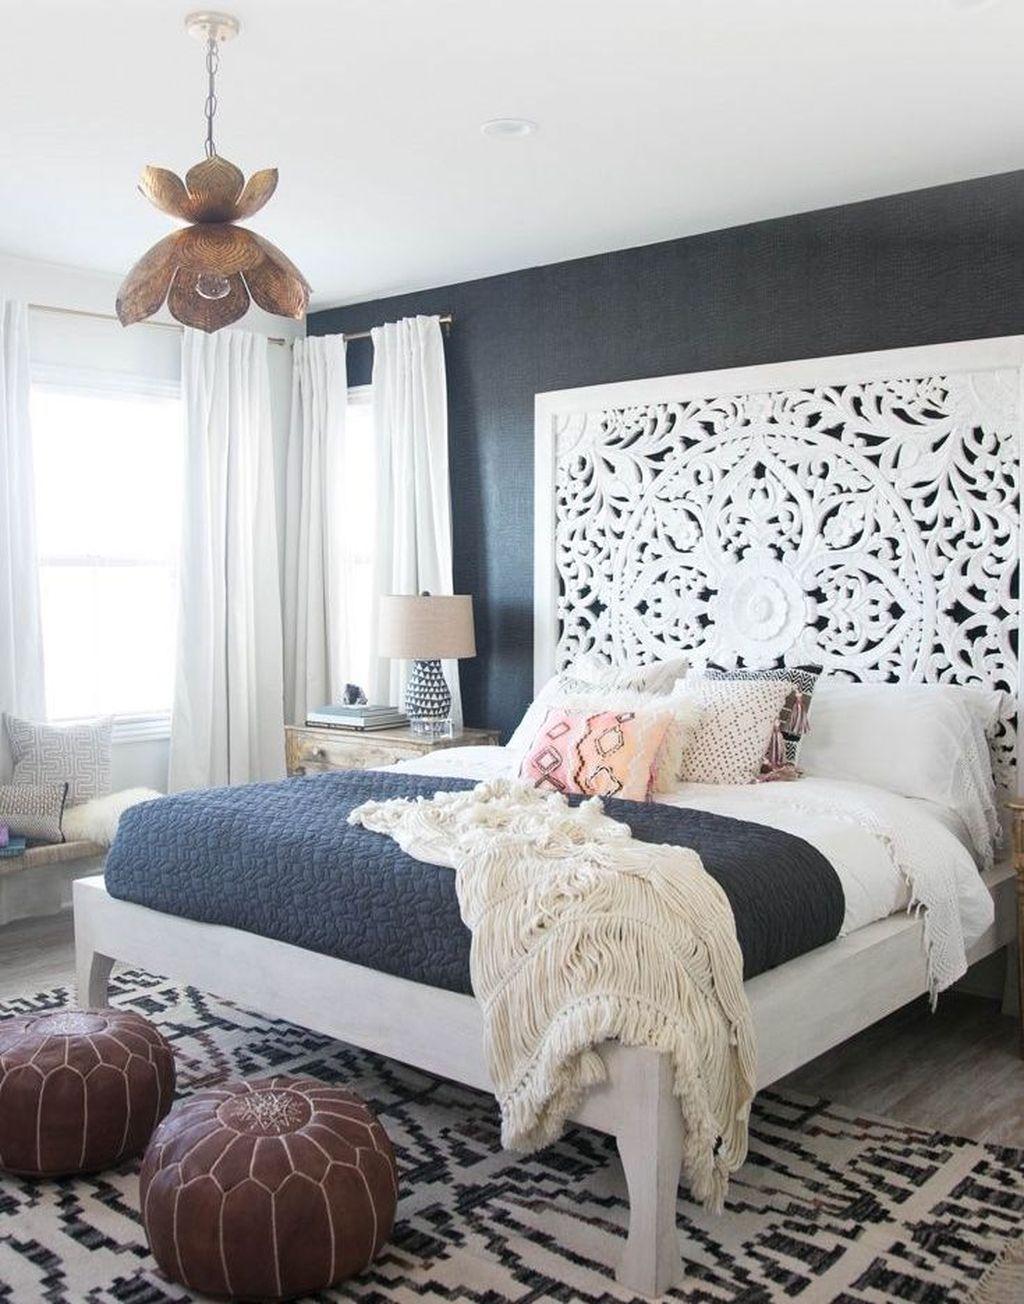 41 Beautiful Master Bedroom Makeover Design Ideas | Bedroom ...